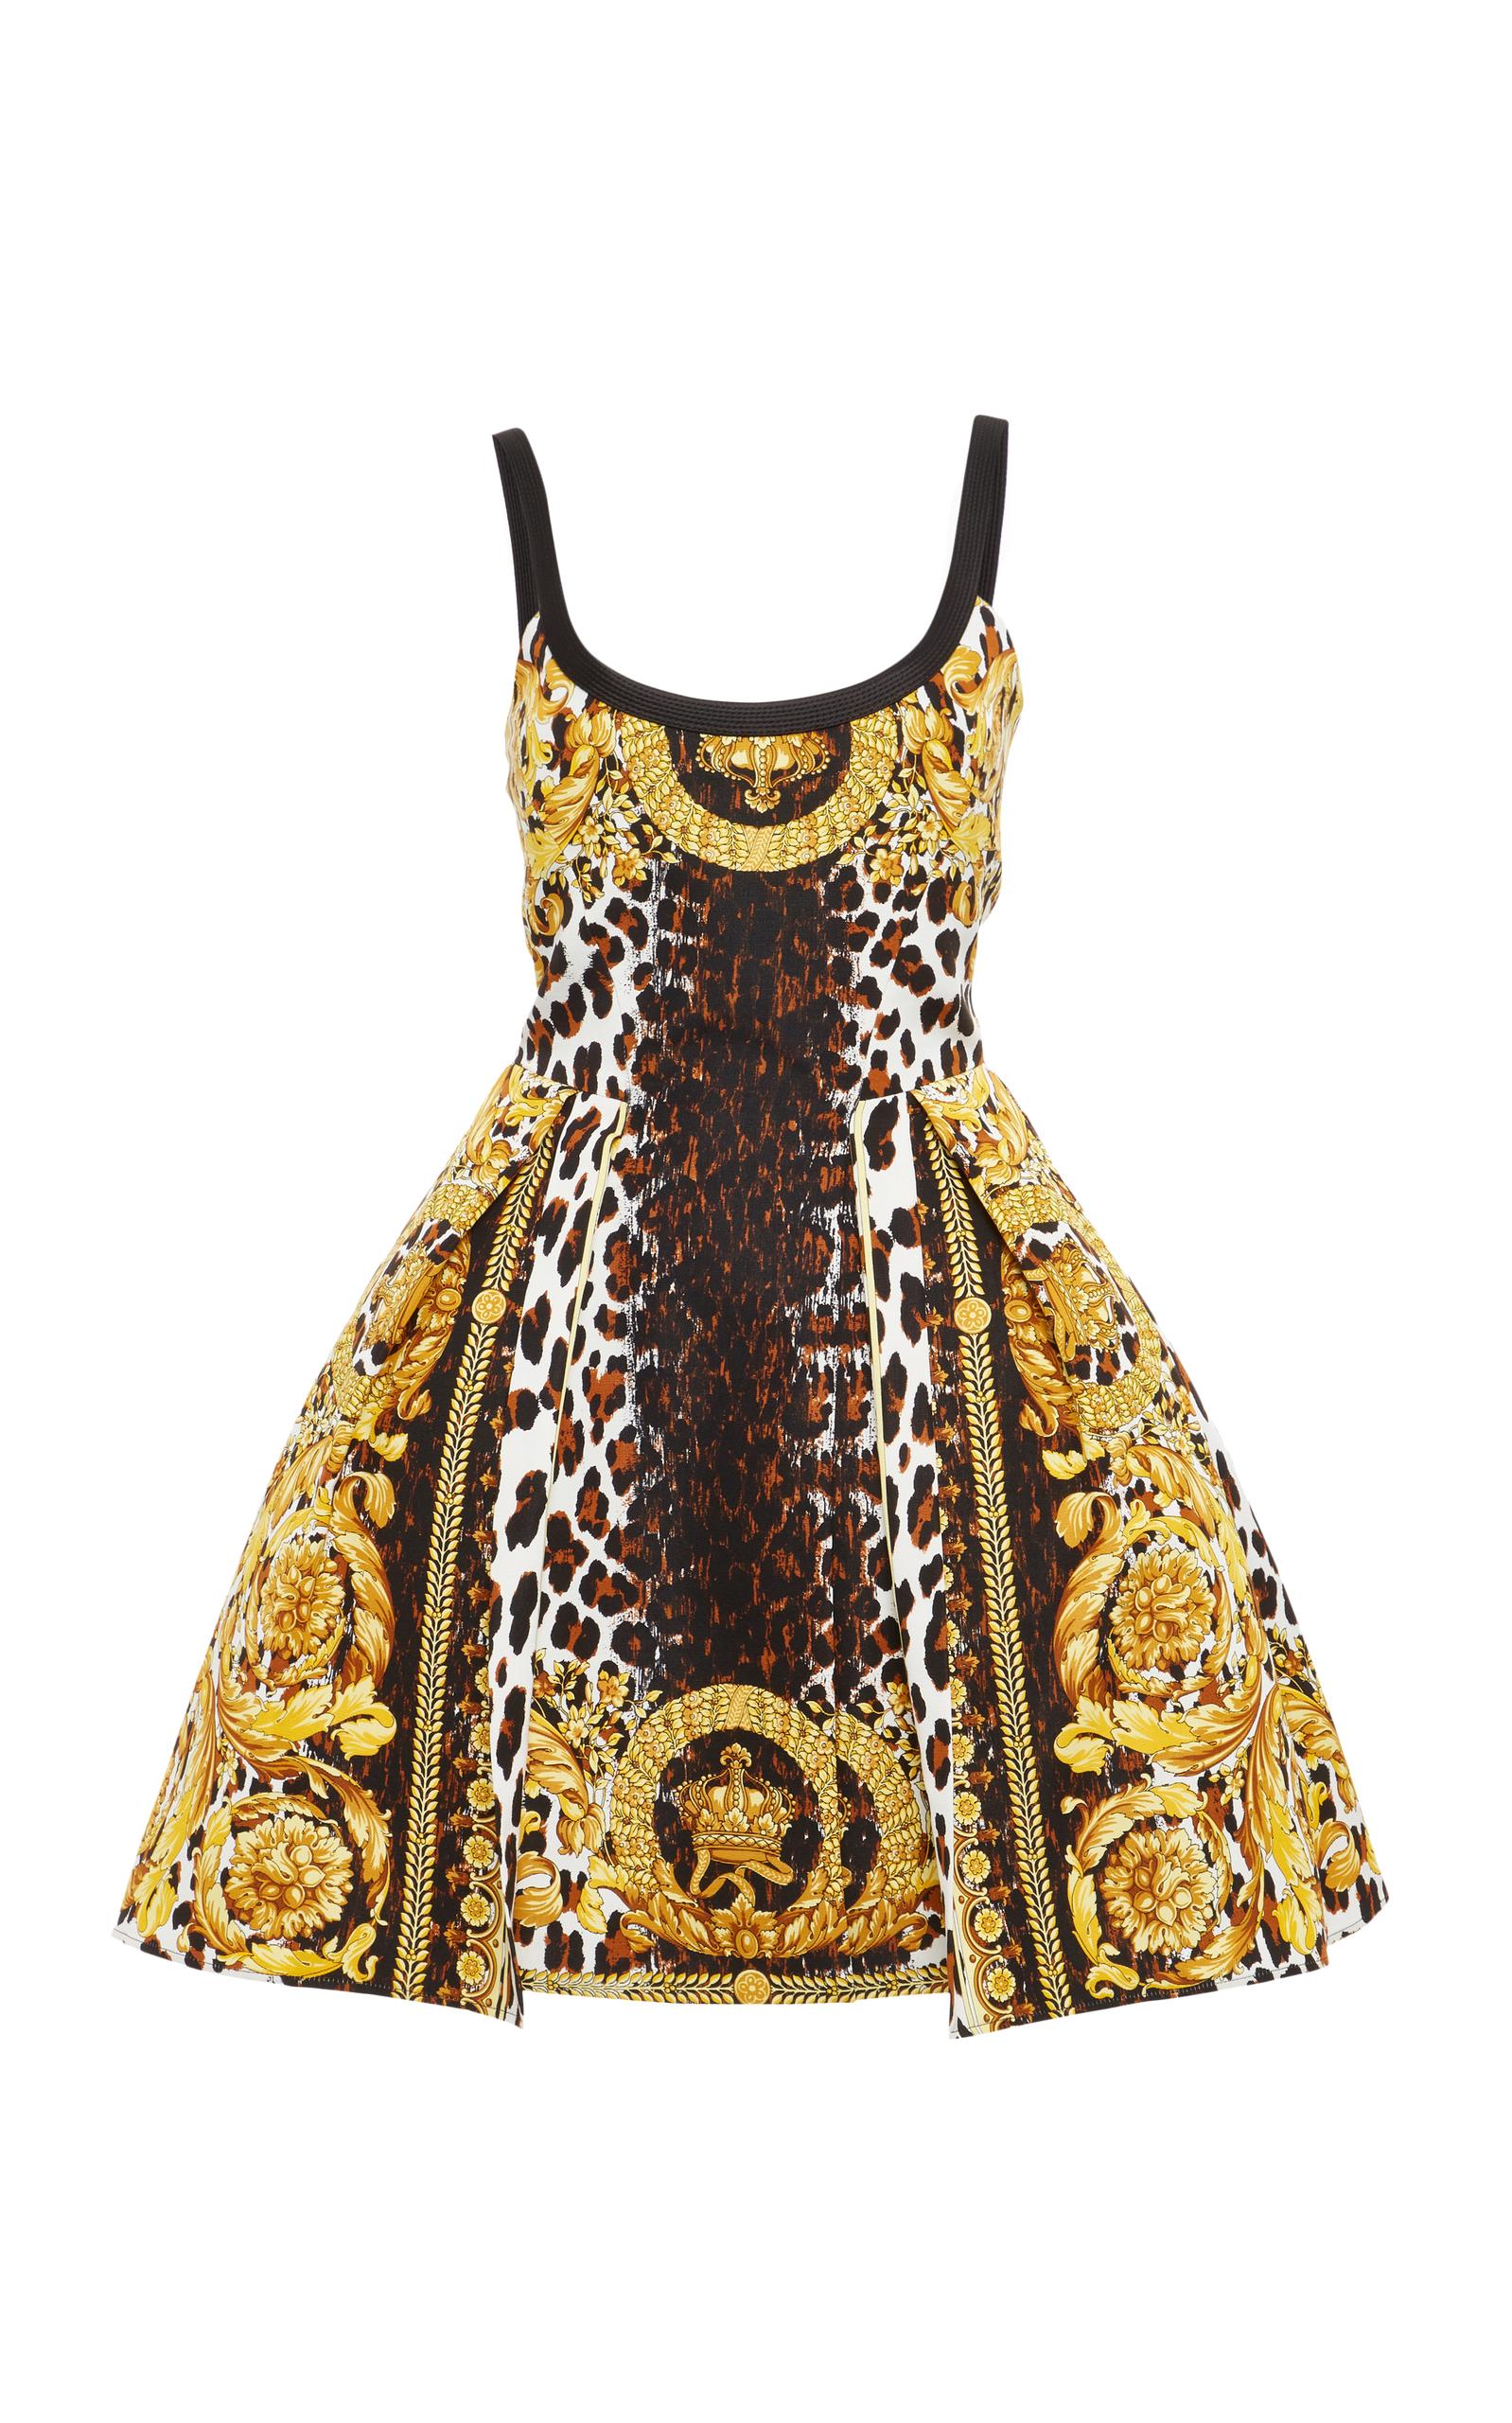 6f1b887d492 VersaceFlounced Printed Dress. CLOSE. Loading